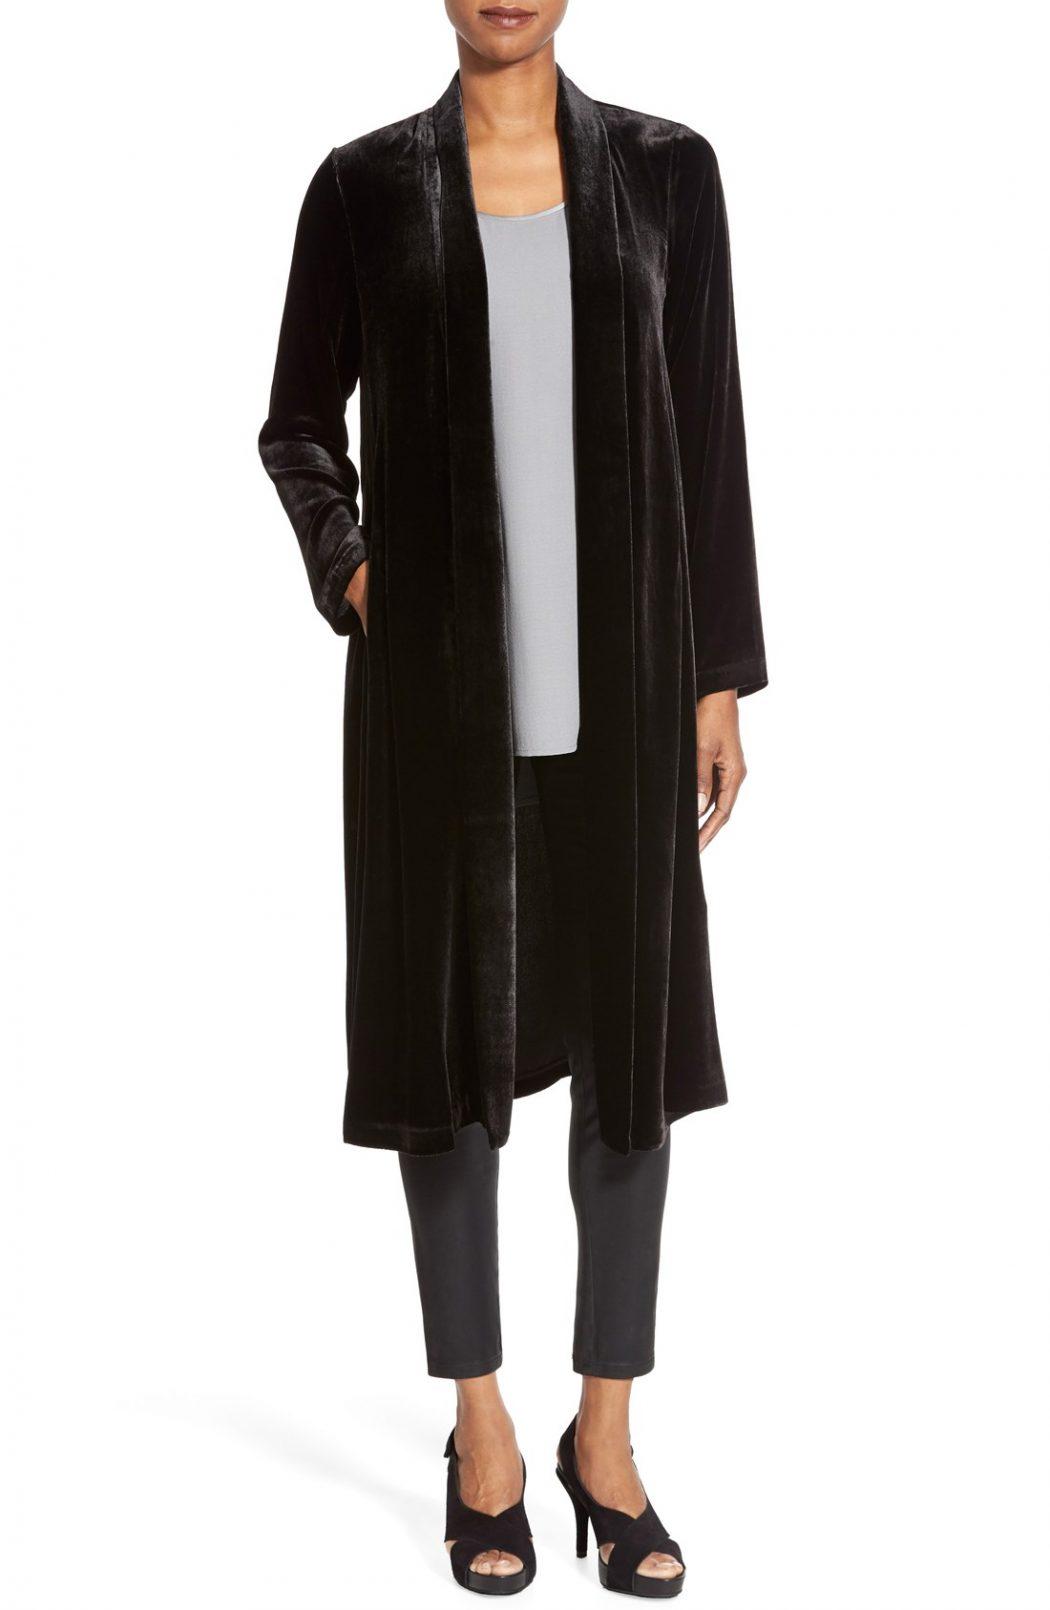 Long-Black-Coat2 8 Main Winter & Fall Jackets & Coats Trends in 2020